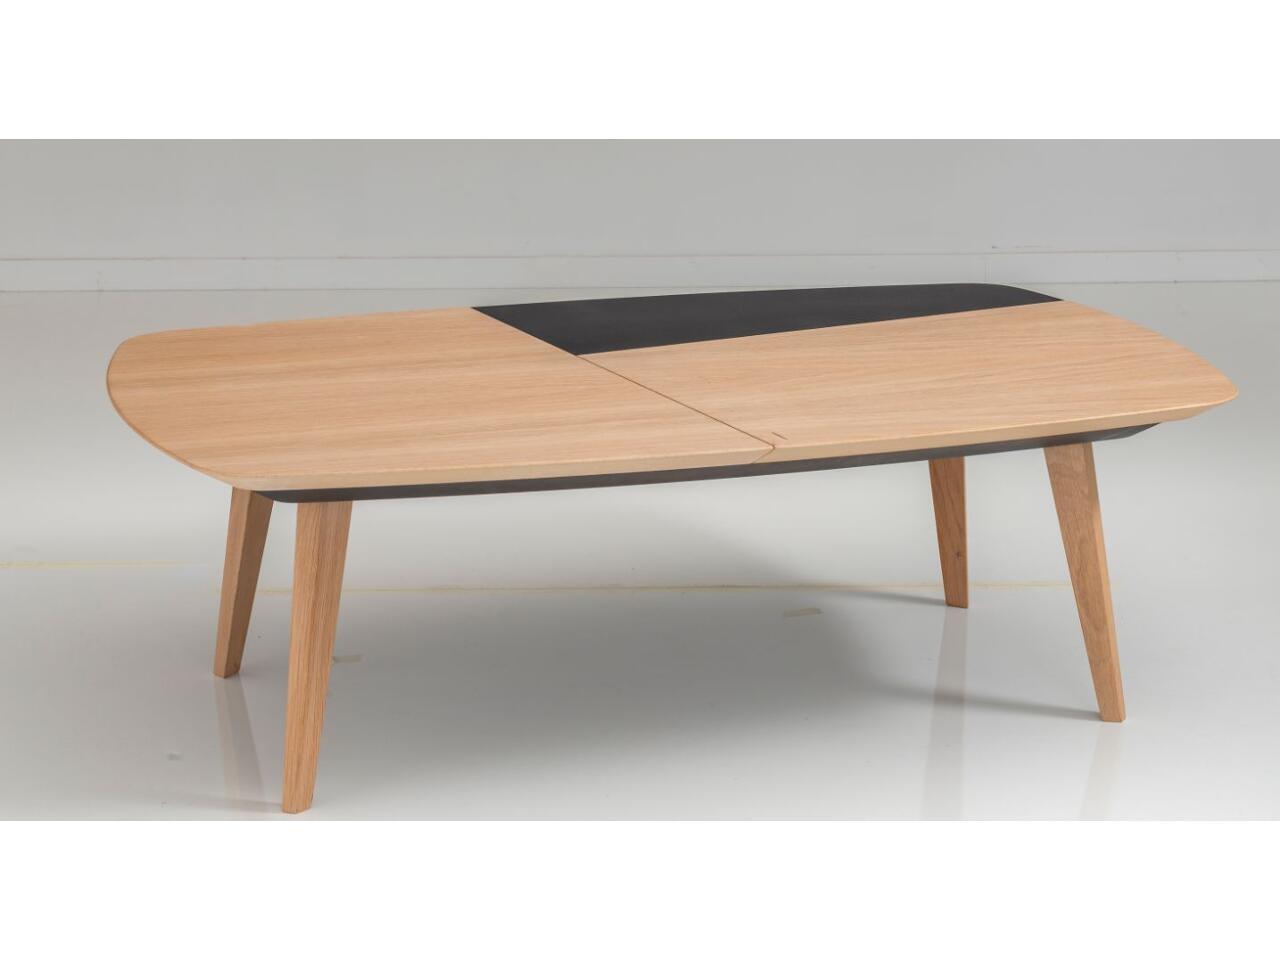 Table Basse Plateau Relevable A Villefranche S Saone